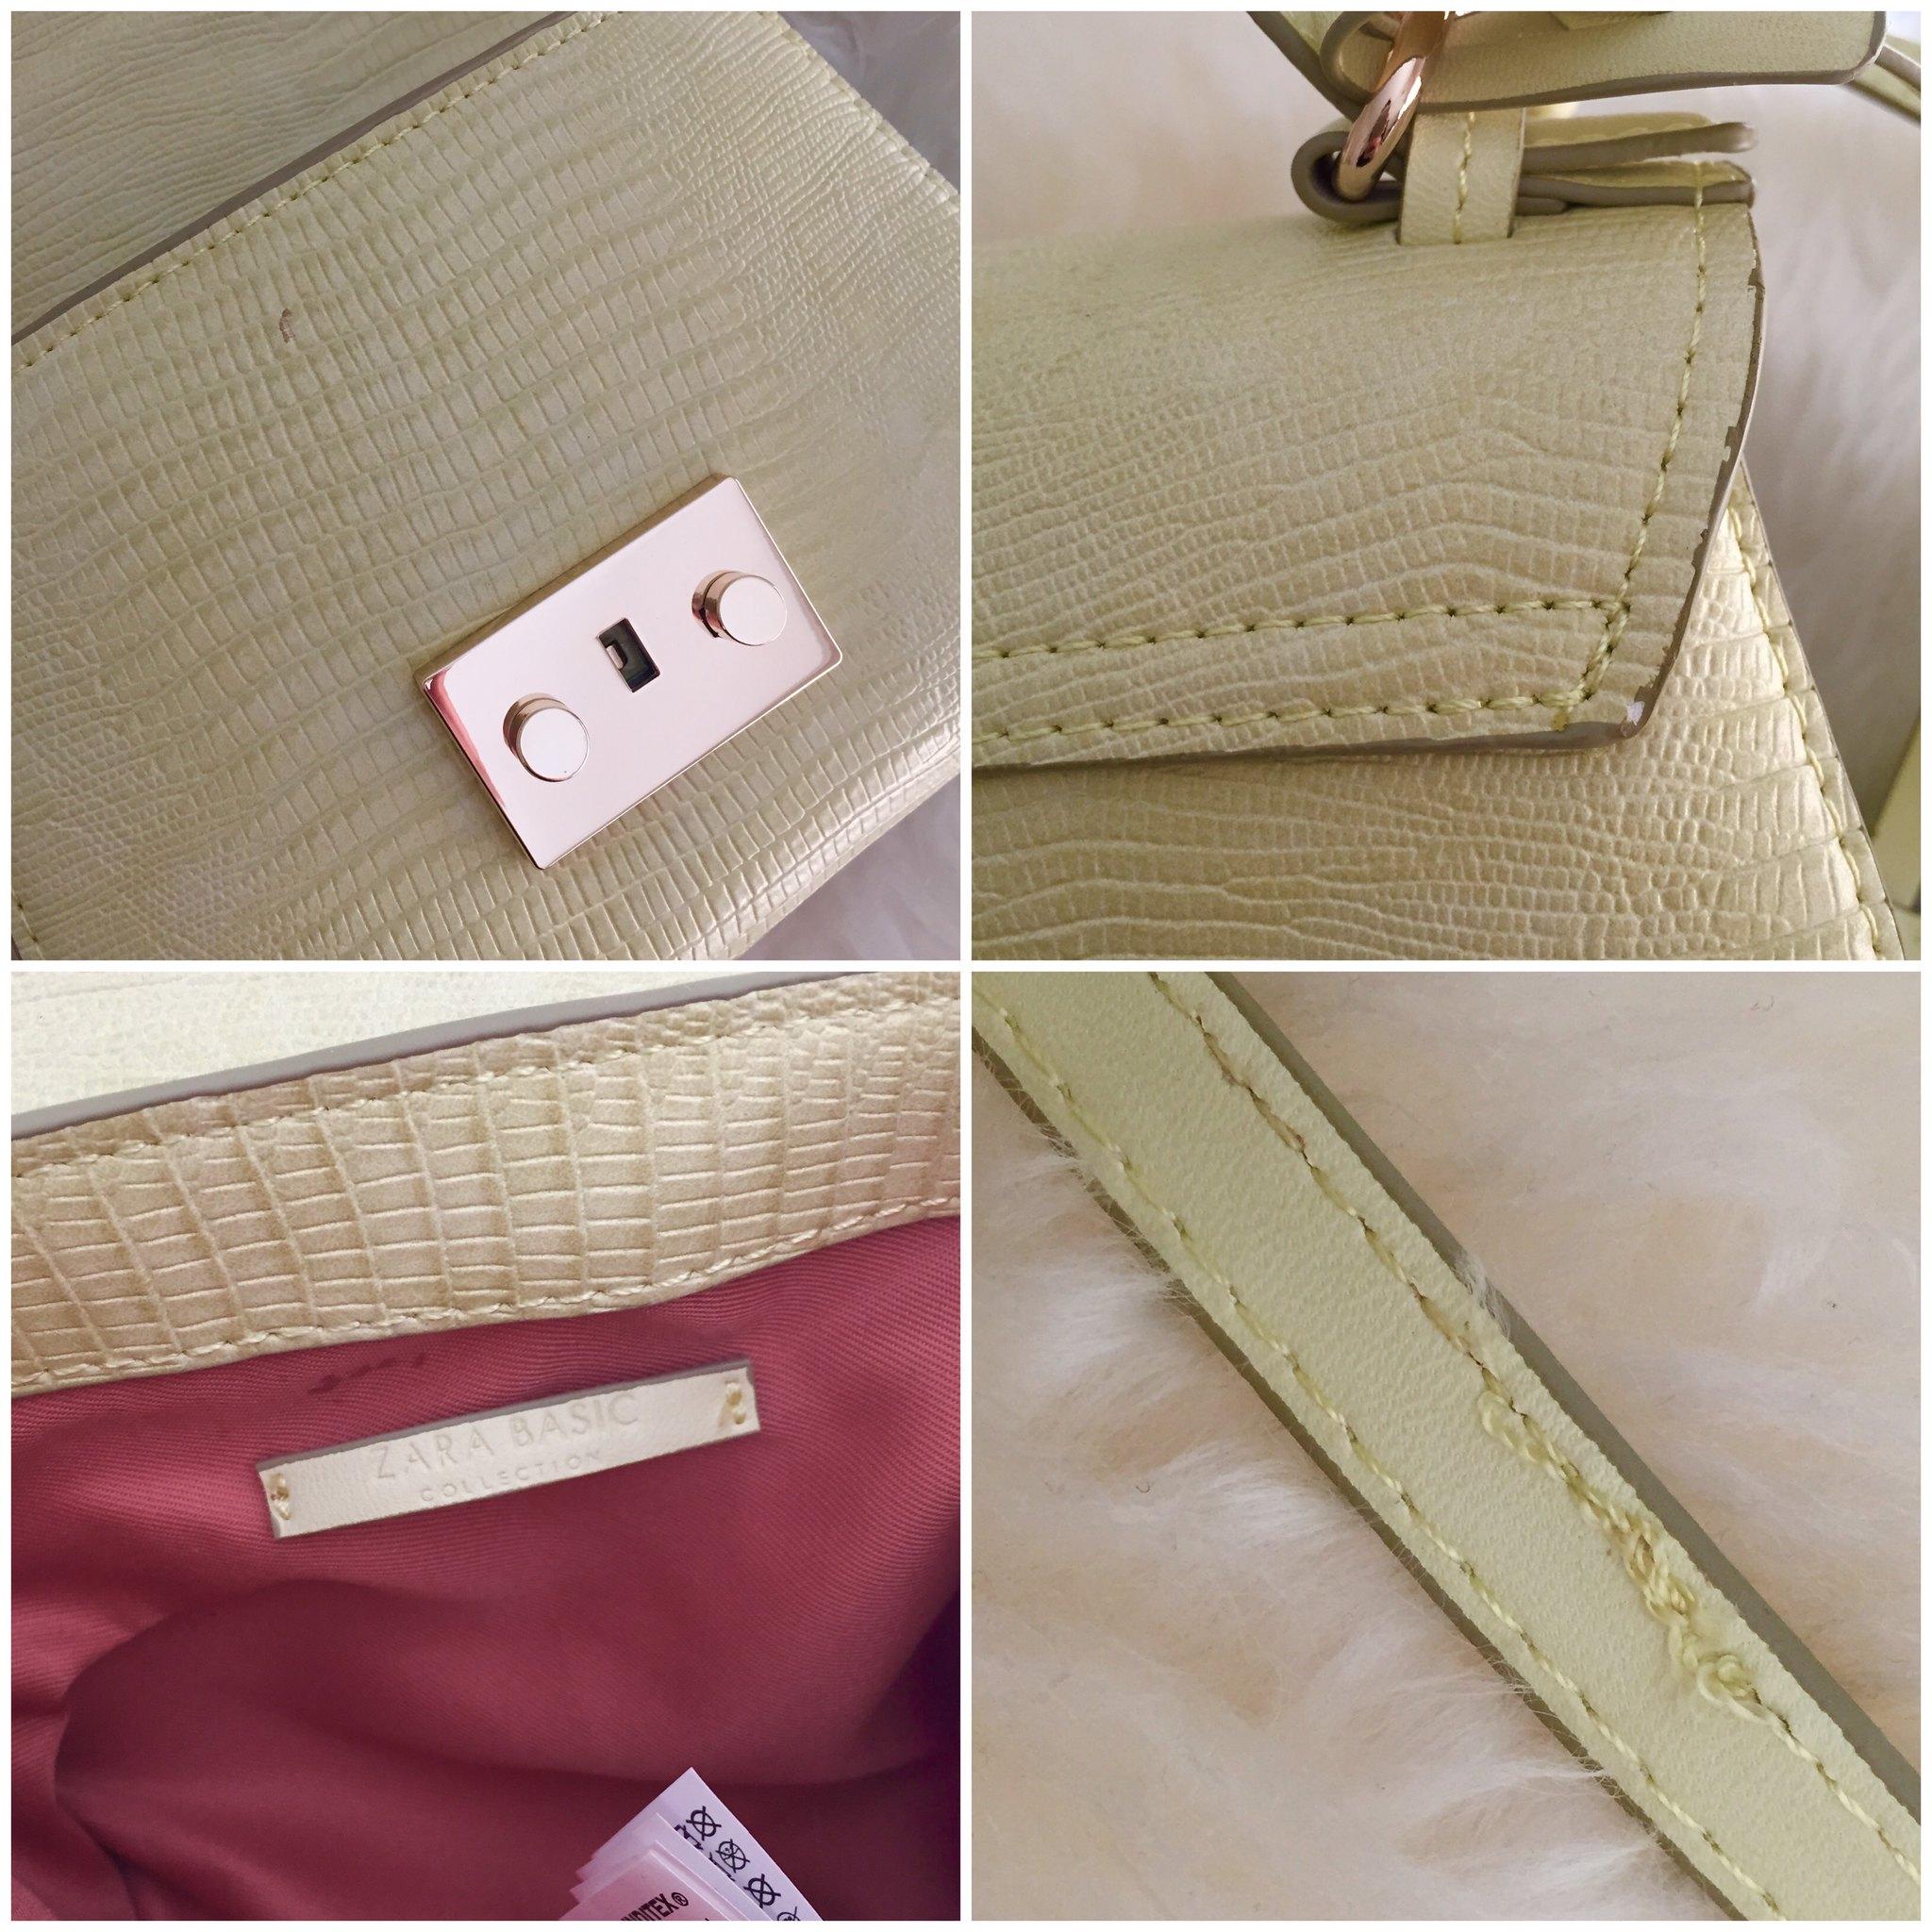 Zara Mini City Bag in Lime Green (item no. 4498/0004) - defects